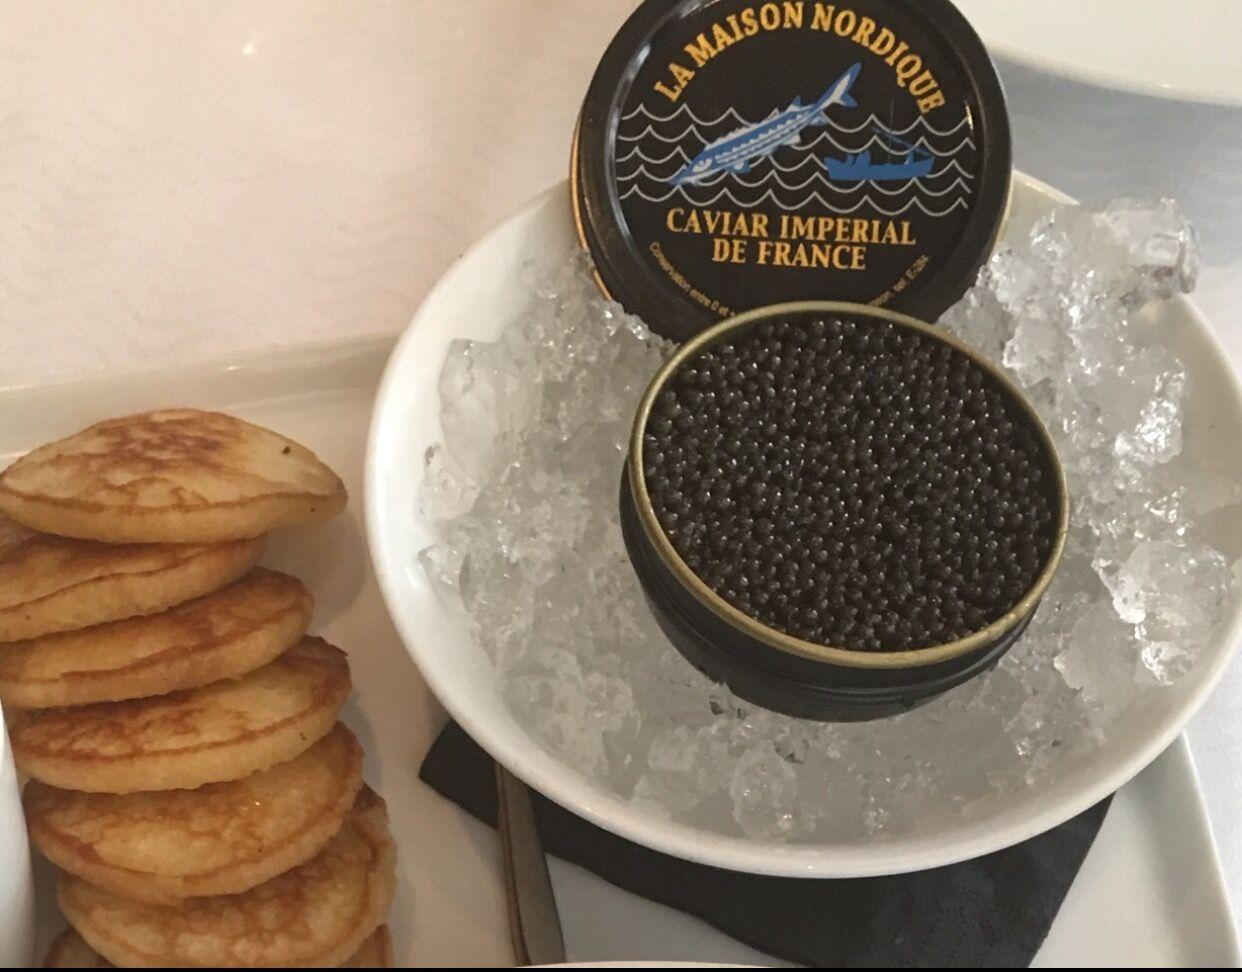 Caviar at Hotel Costes